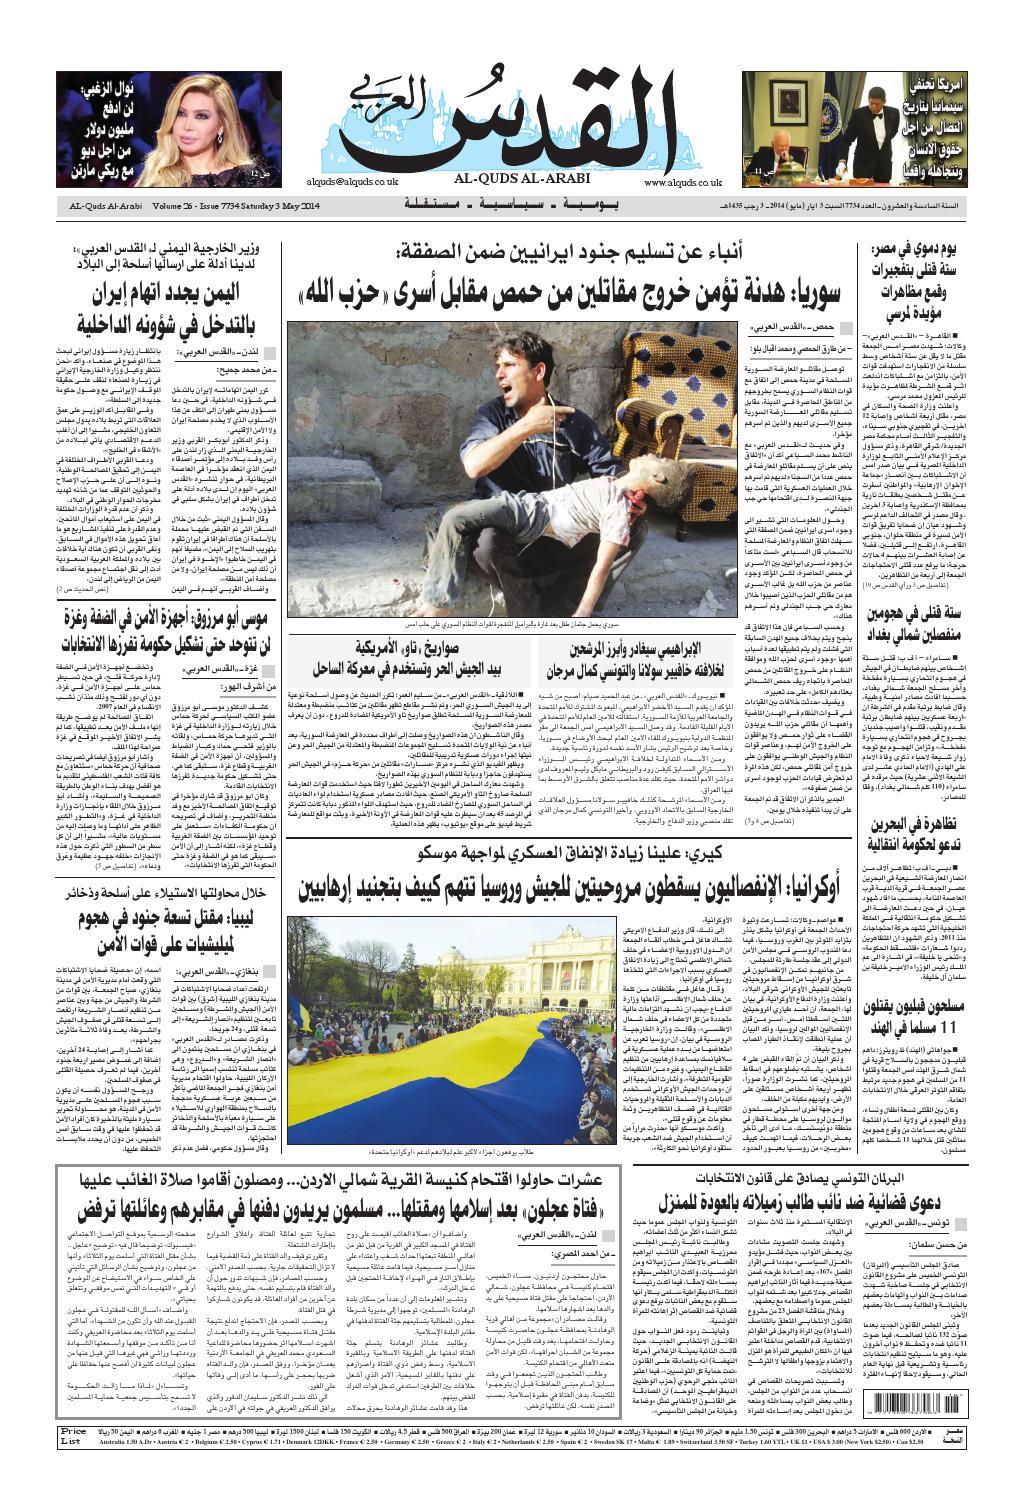 c3ff81931 صحيفة القدس العربي , السبت والأحد 03/04.05.2014 by مركز الحدث - issuu